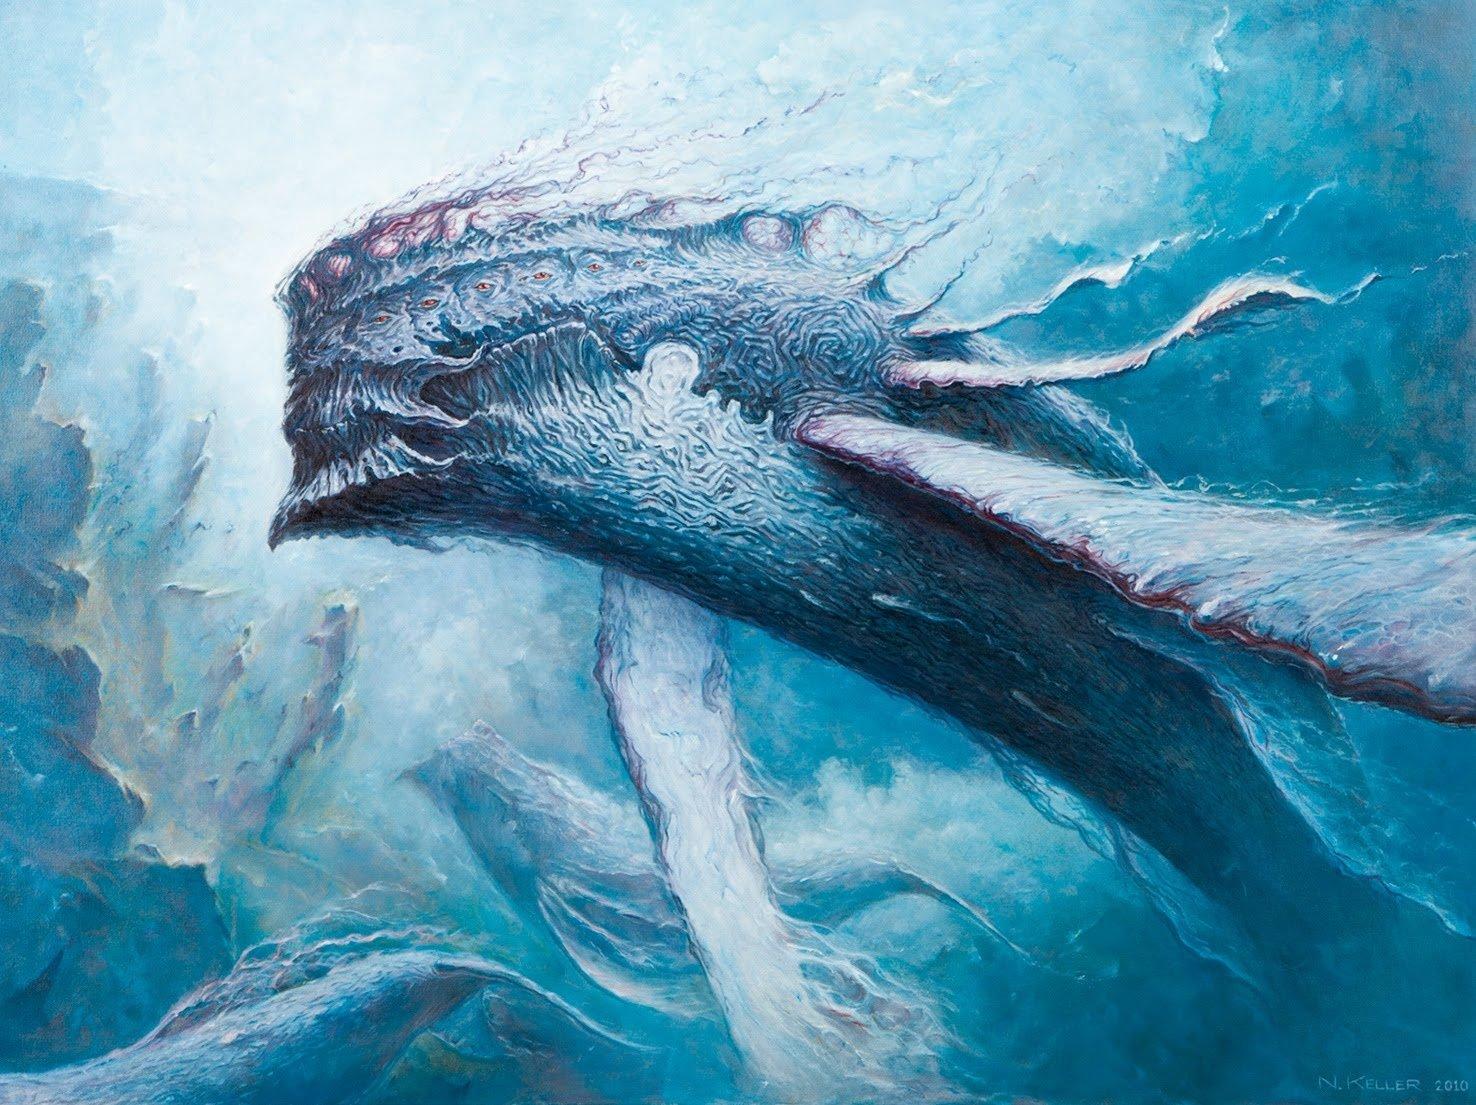 Leviathan Computer Wallpapers, Desktop Backgrounds | 1523x800 | ID ...